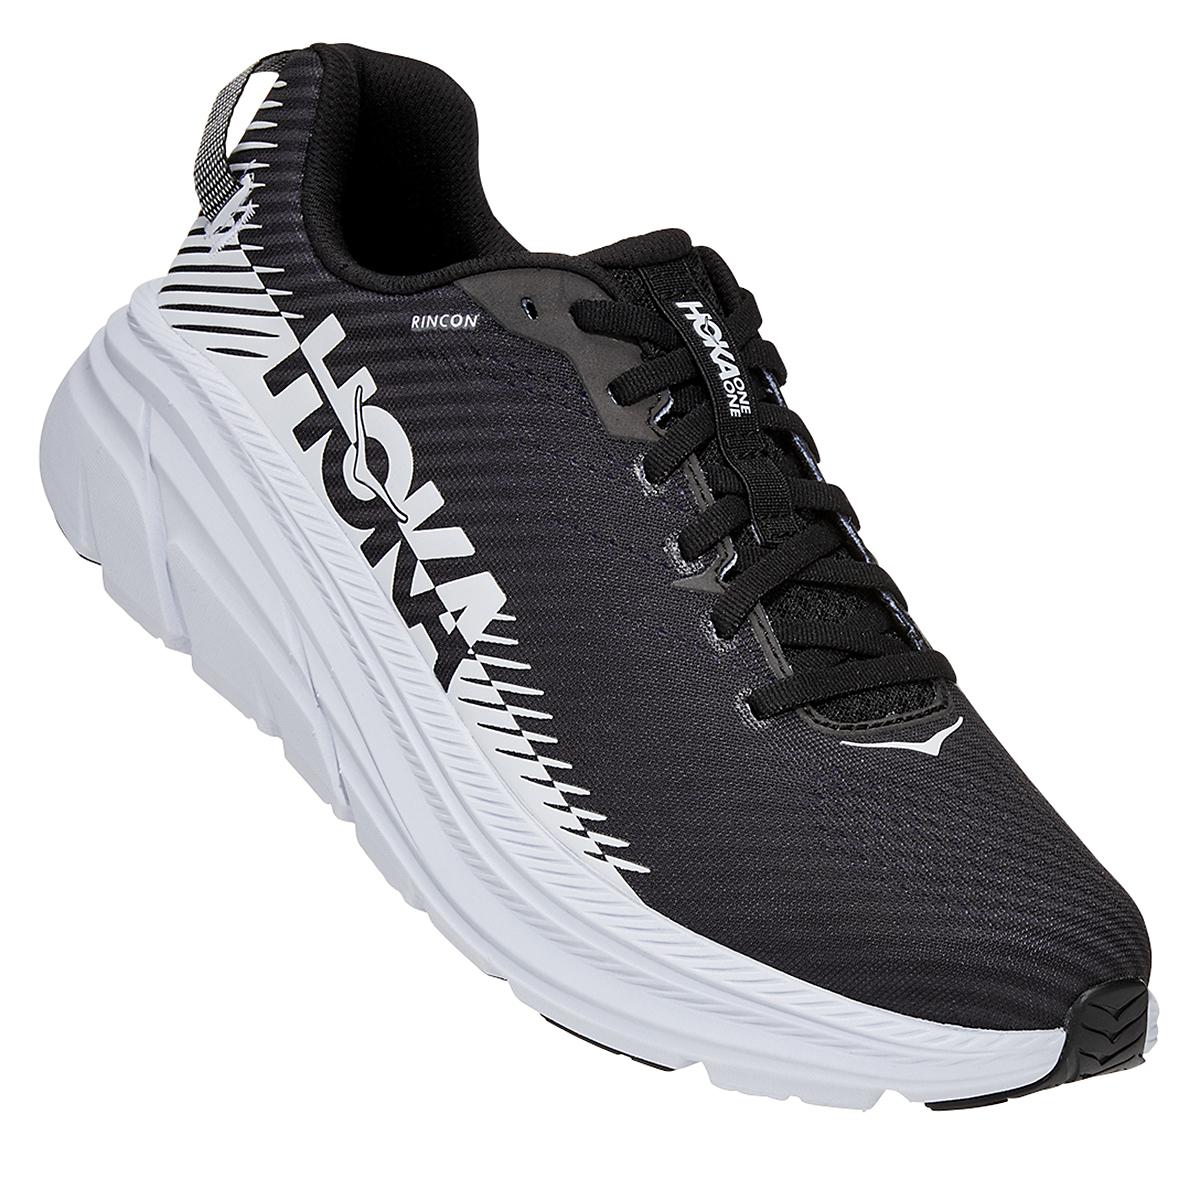 Men's Hoka One One Rincon 2 Running Shoe - Color: Black/White - Size: 8 - Width: Regular, Black/White, large, image 3